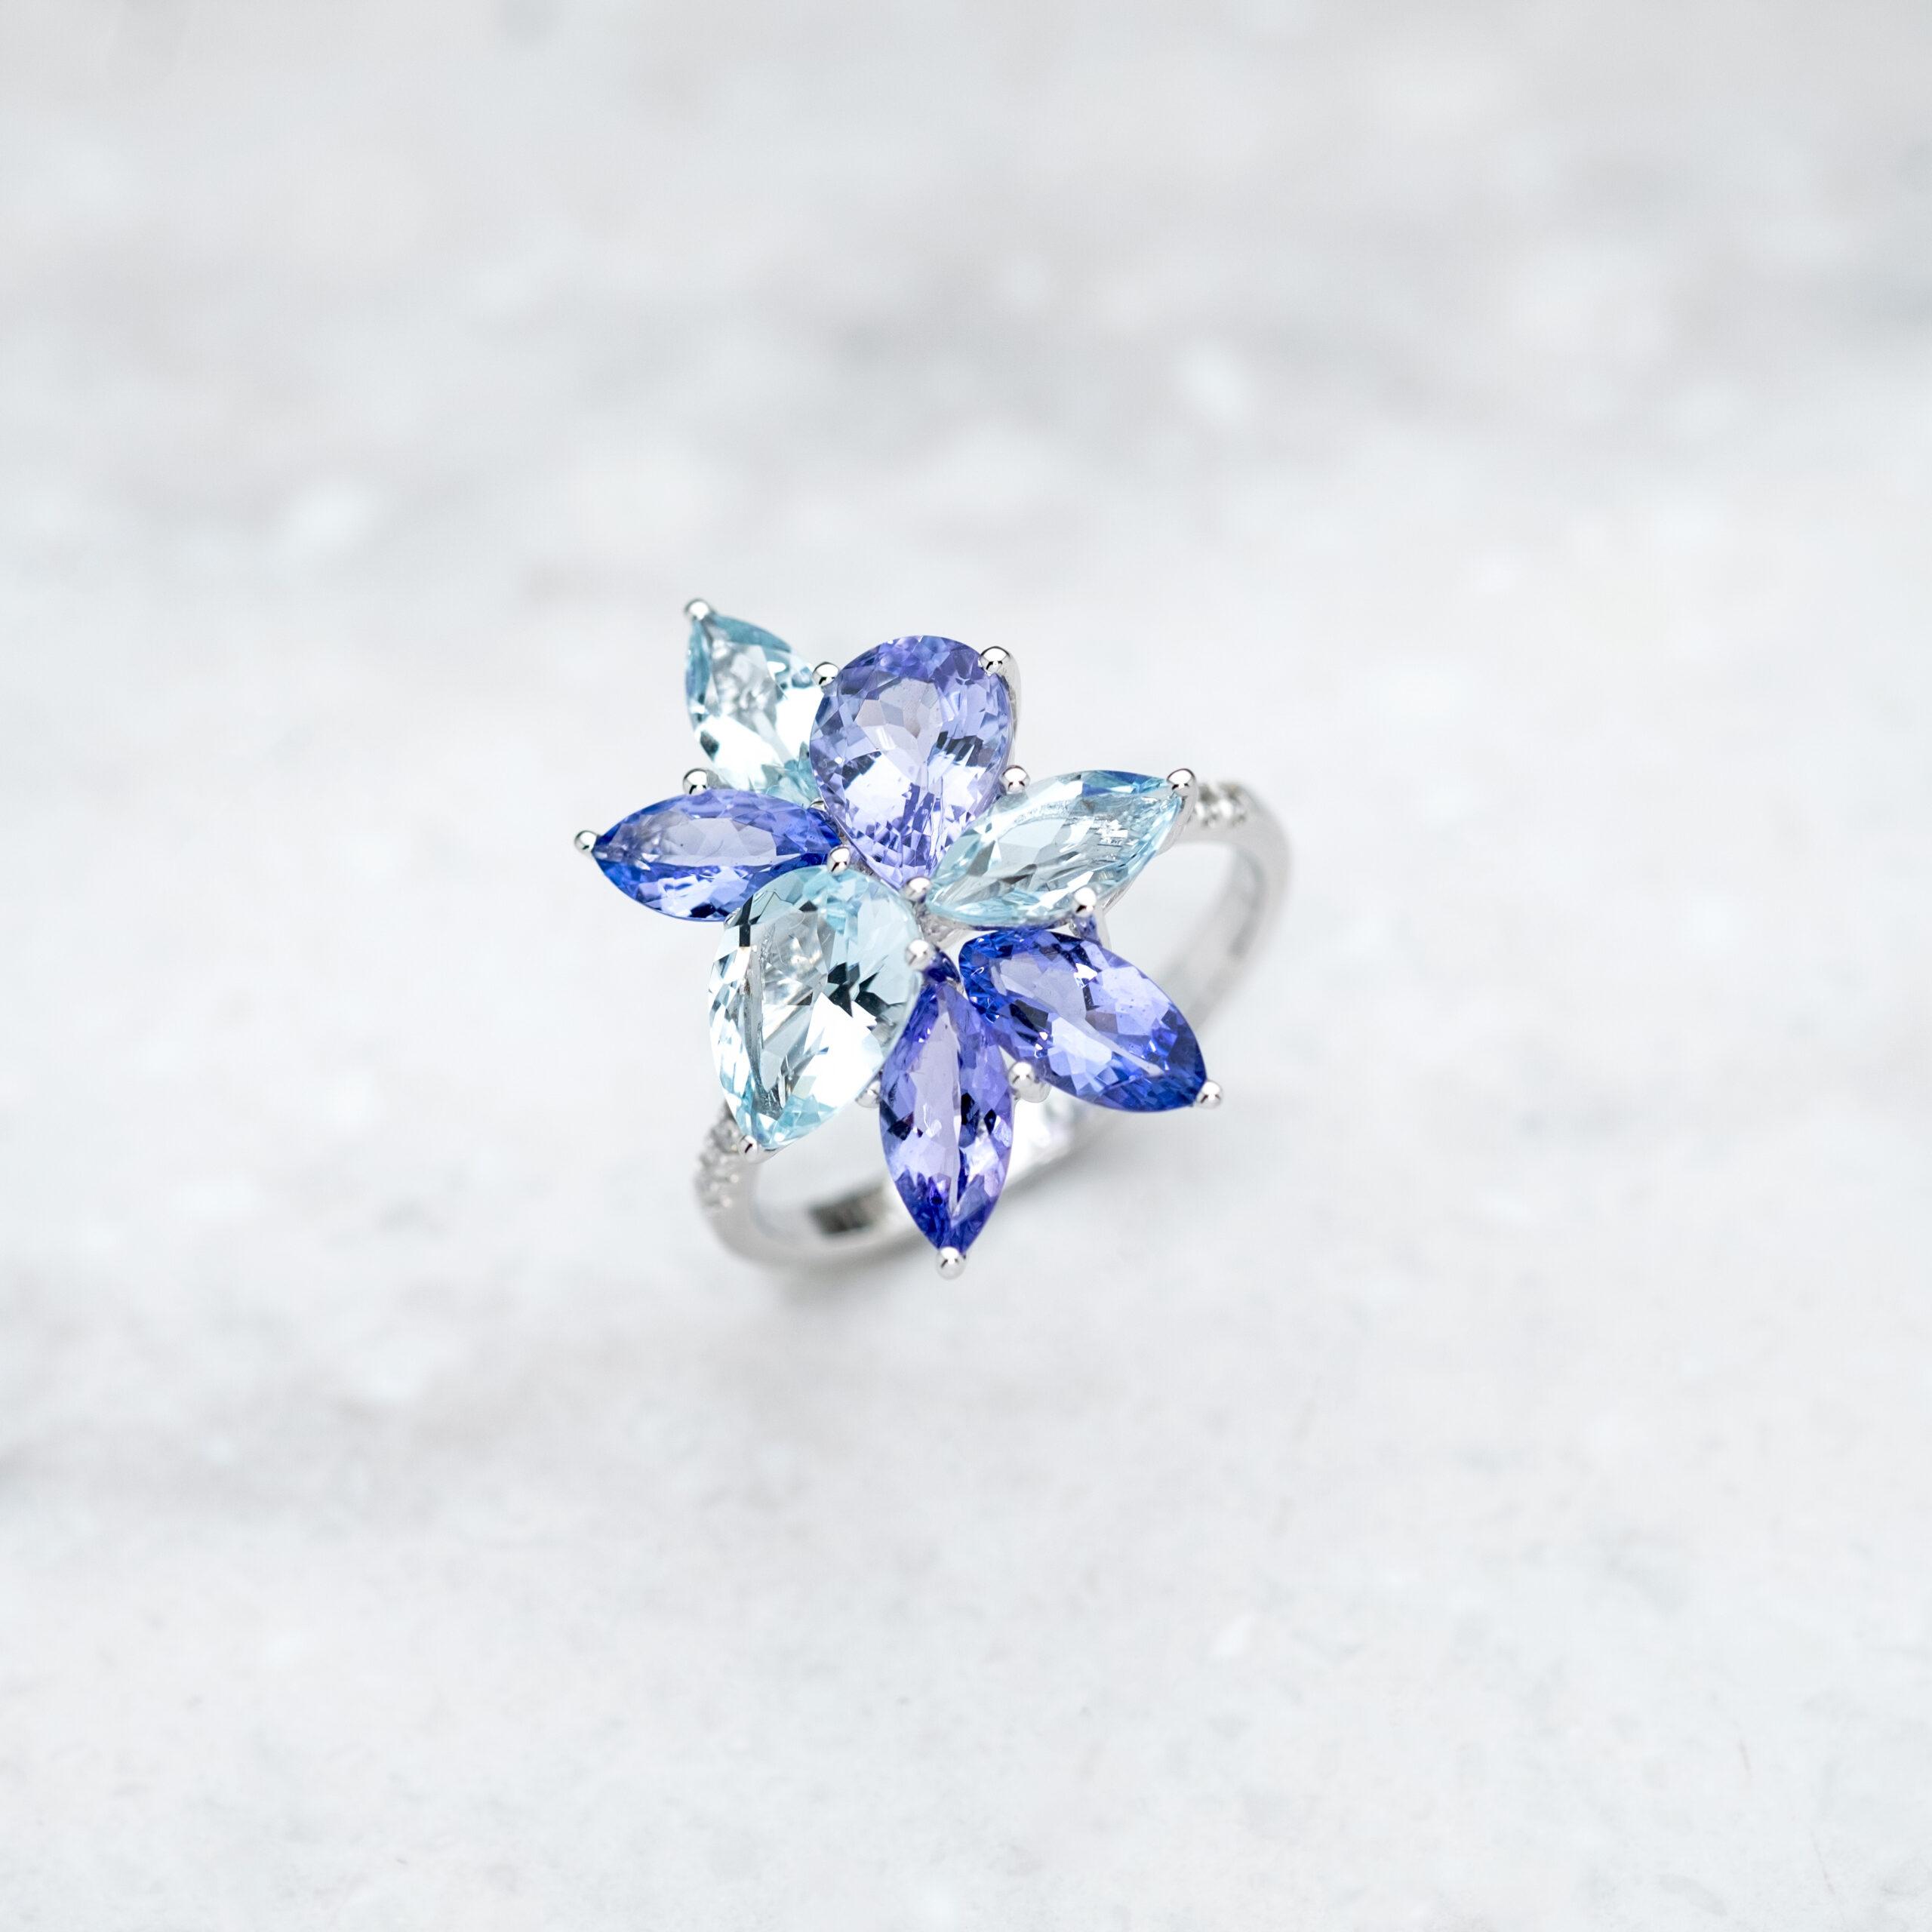 K18WGタンザナイトアクアマリンダイヤリングの画像